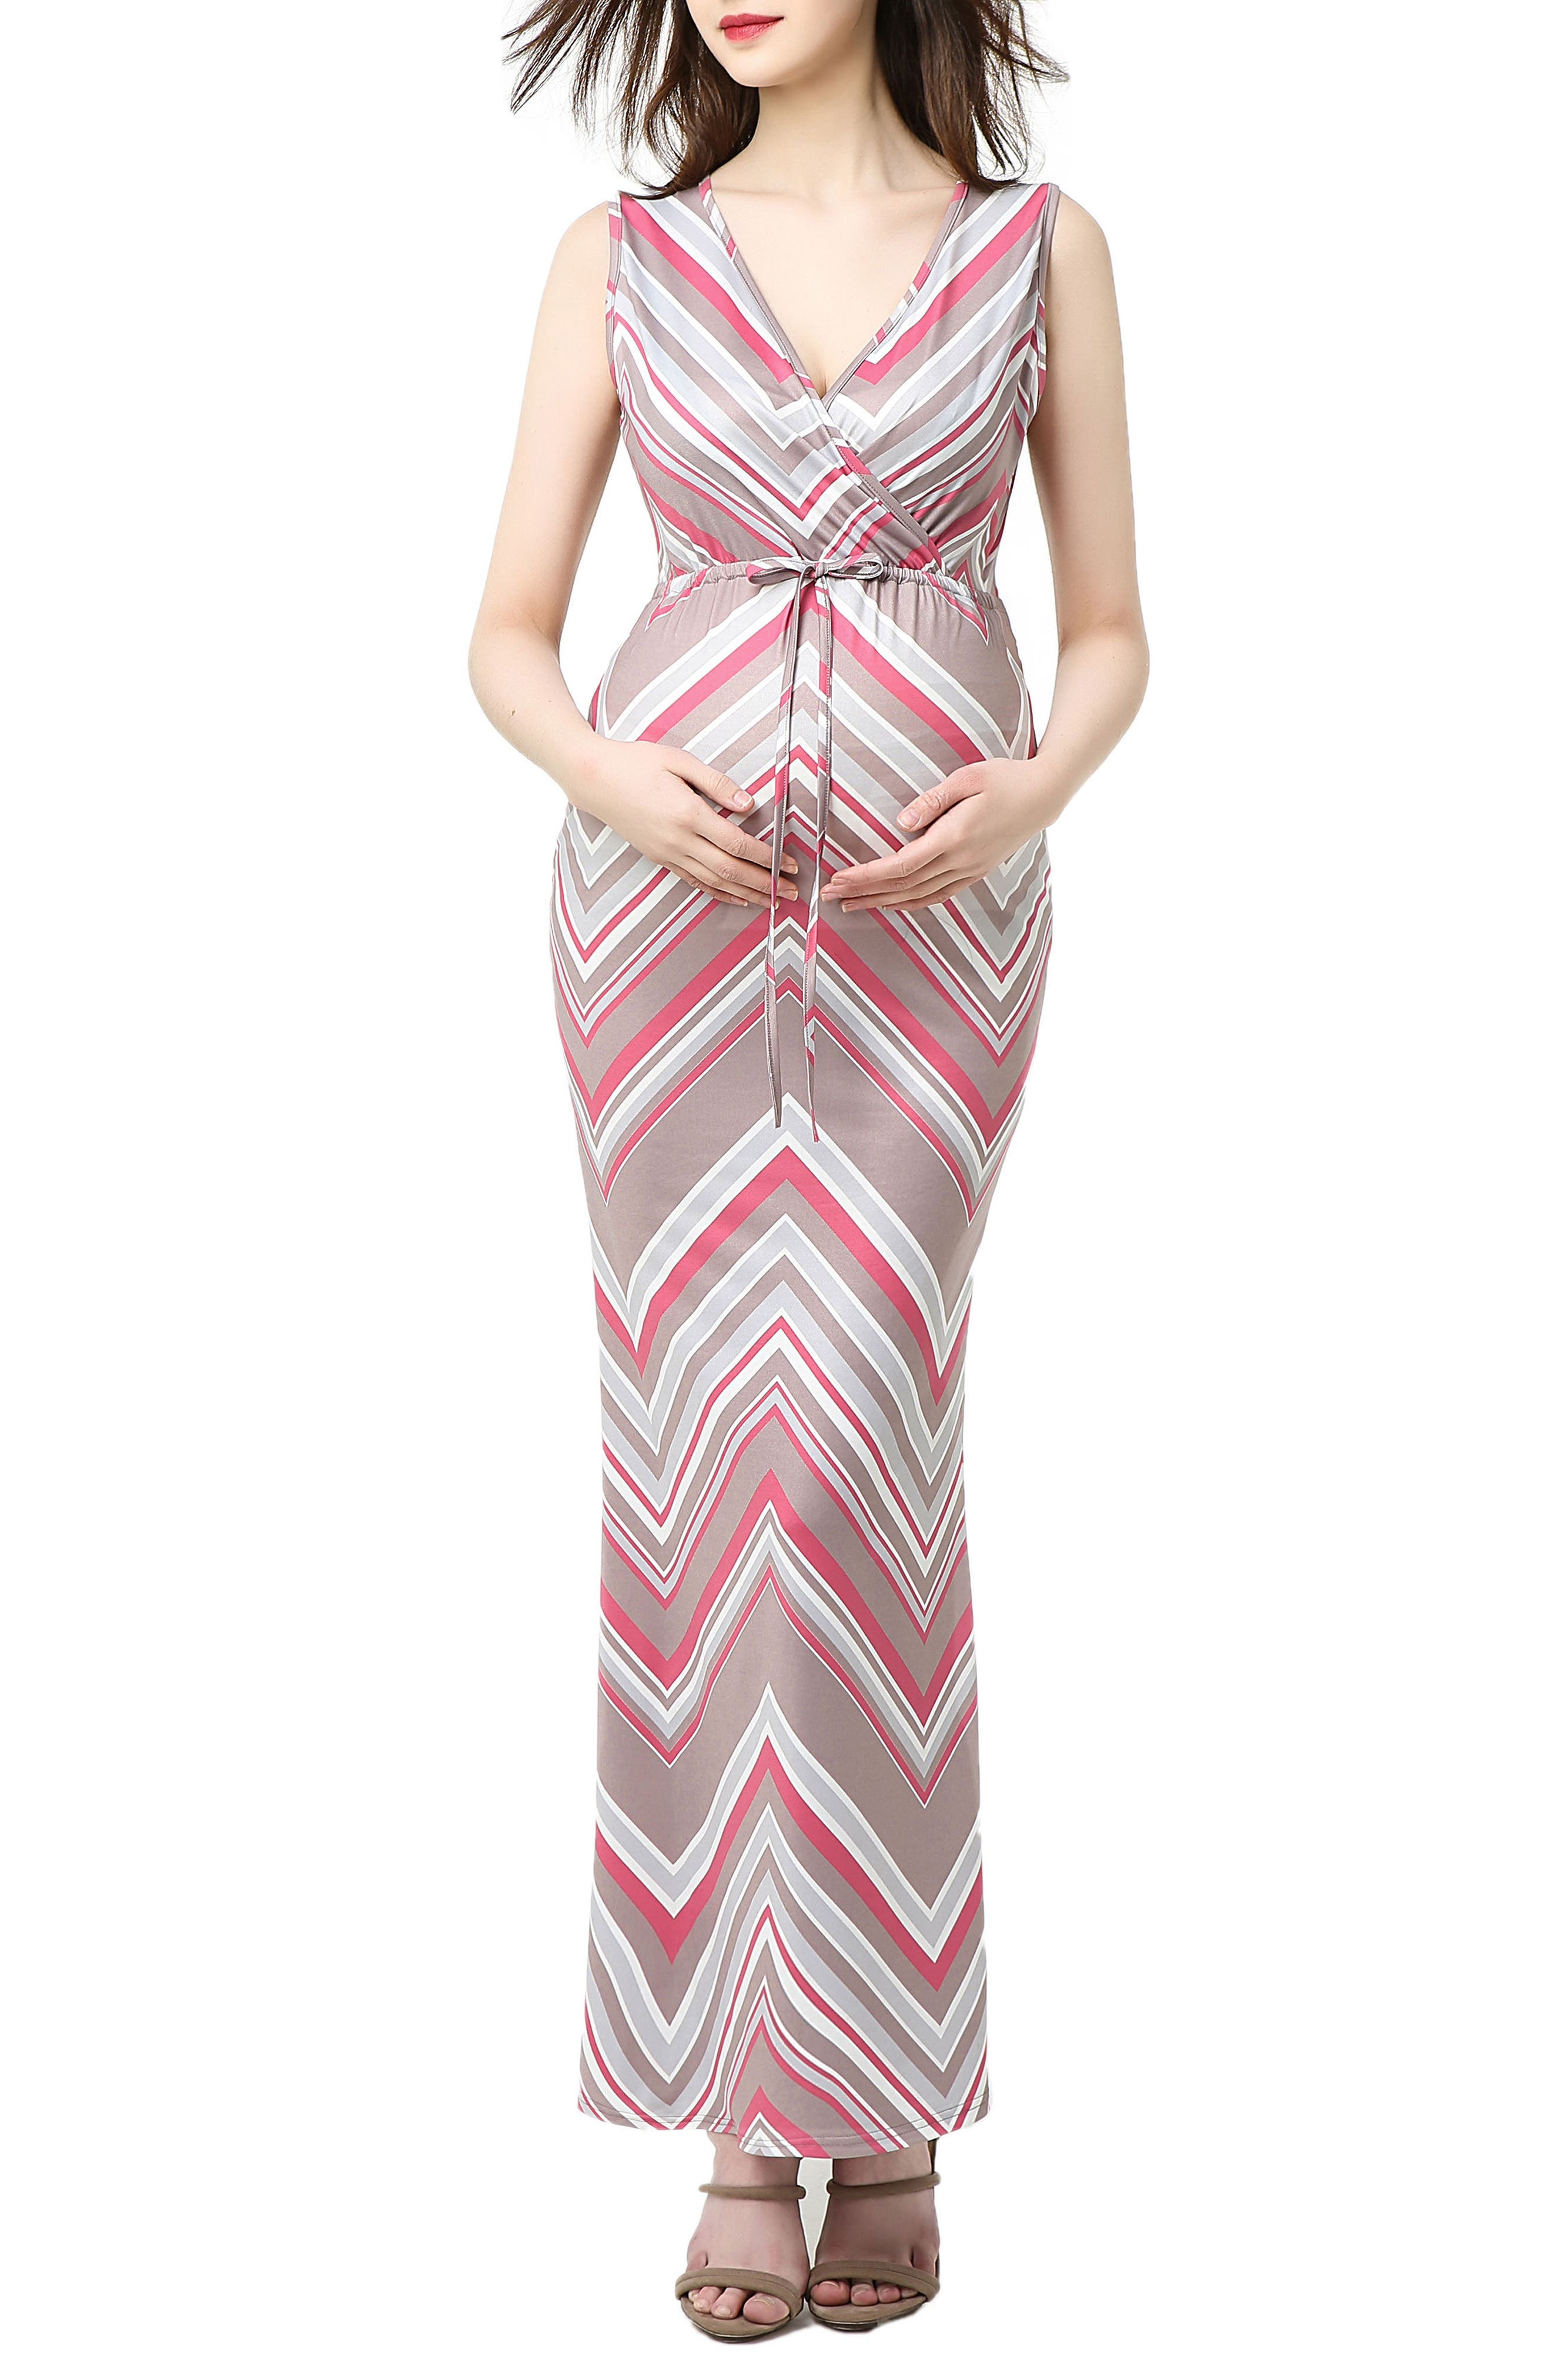 Natalie Chevron Print Maxi Maternity Dress,                             Main thumbnail 1, color,                             MULTICOLORED STRIPE